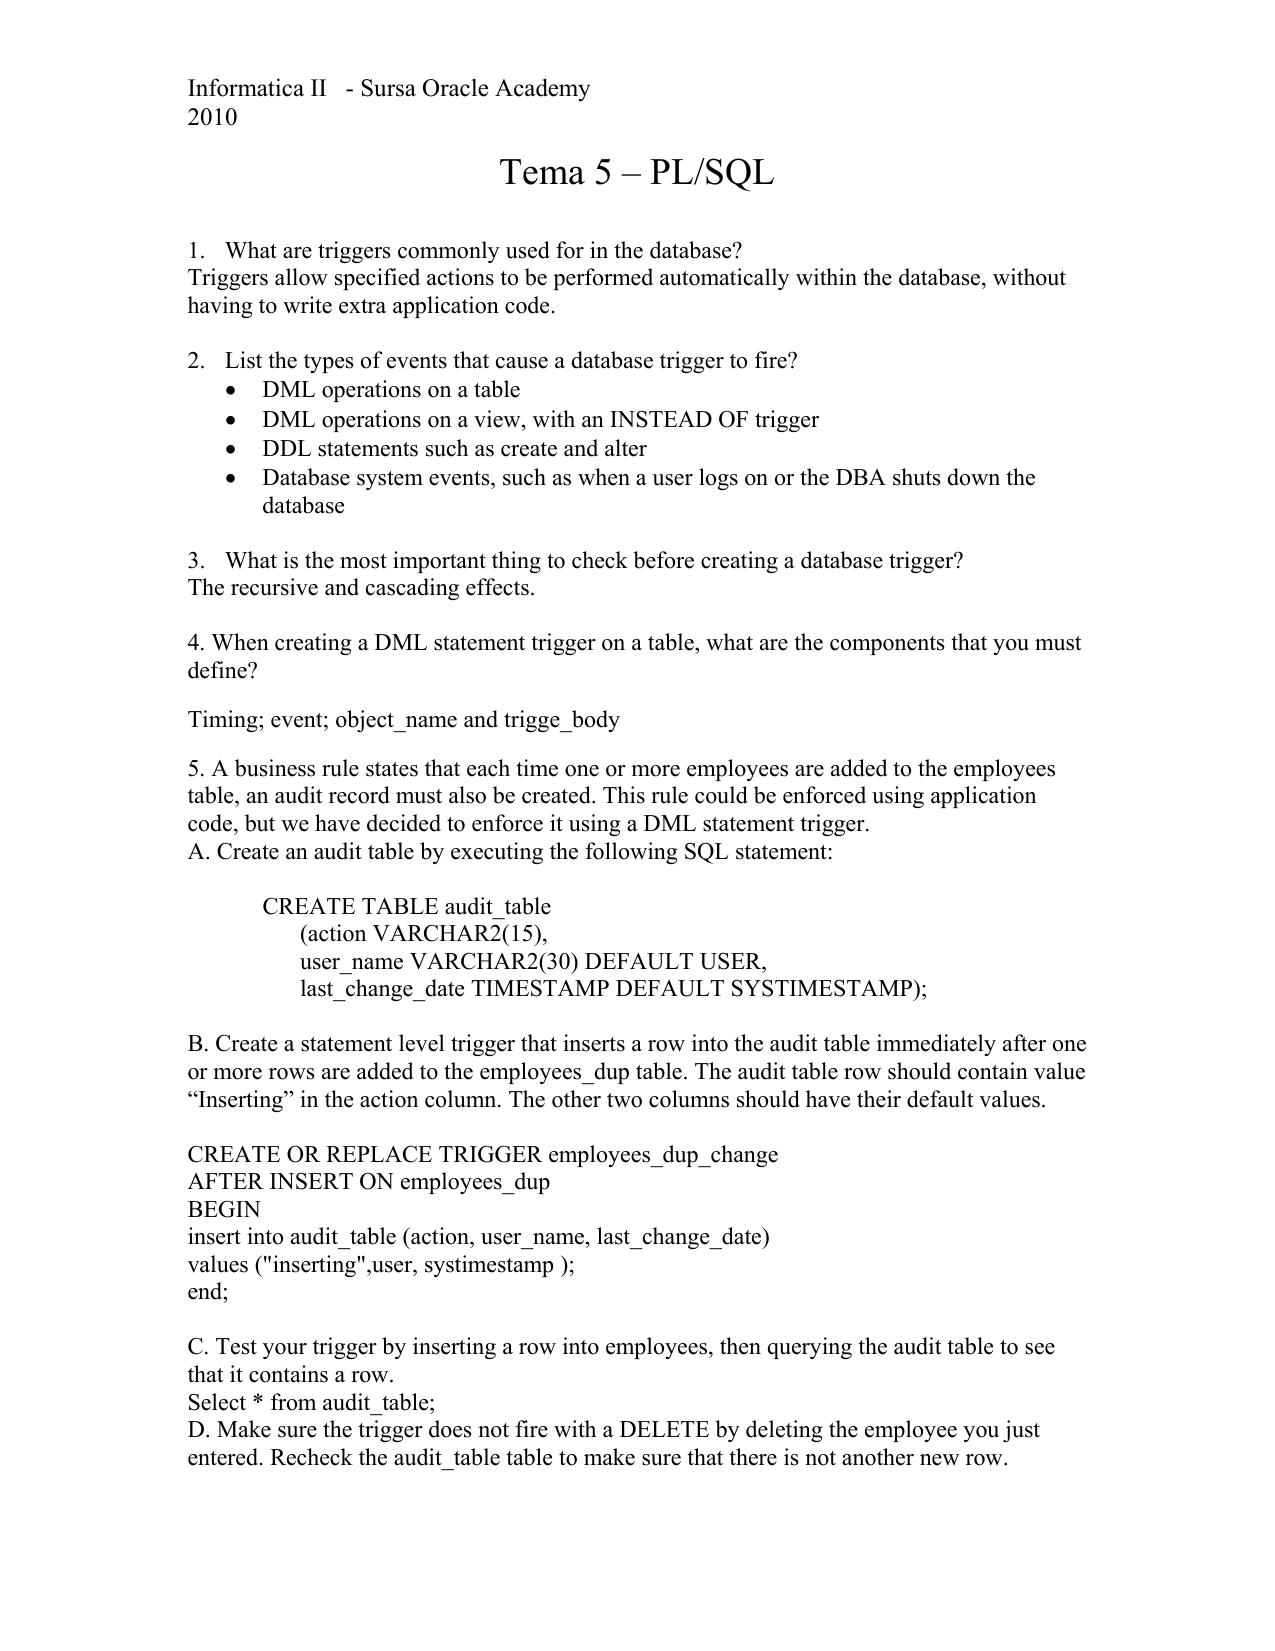 Tema 5 – PL/SQL - Cadre Didactice   manualzz com